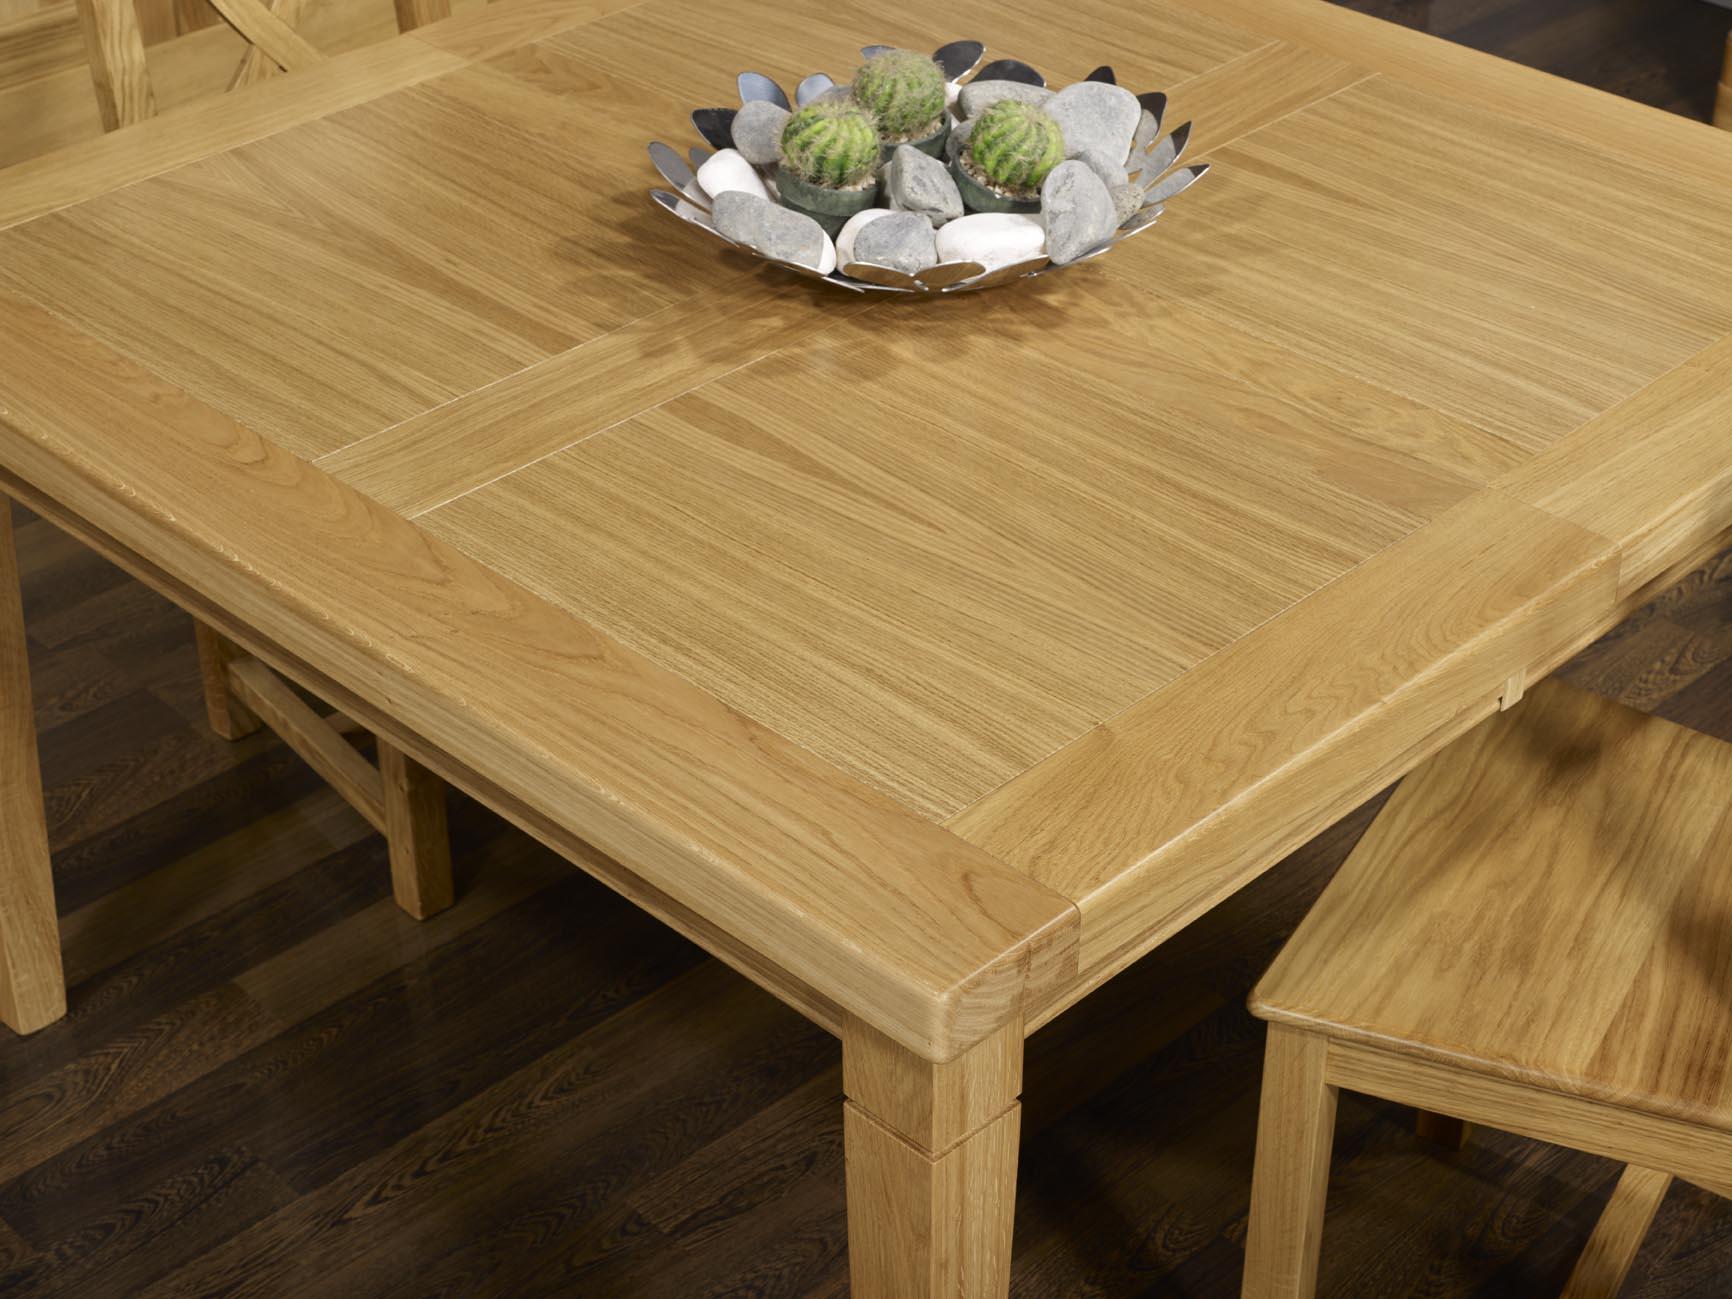 table de campagne 130x130 en ch ne massif 2 allonges de 40. Black Bedroom Furniture Sets. Home Design Ideas